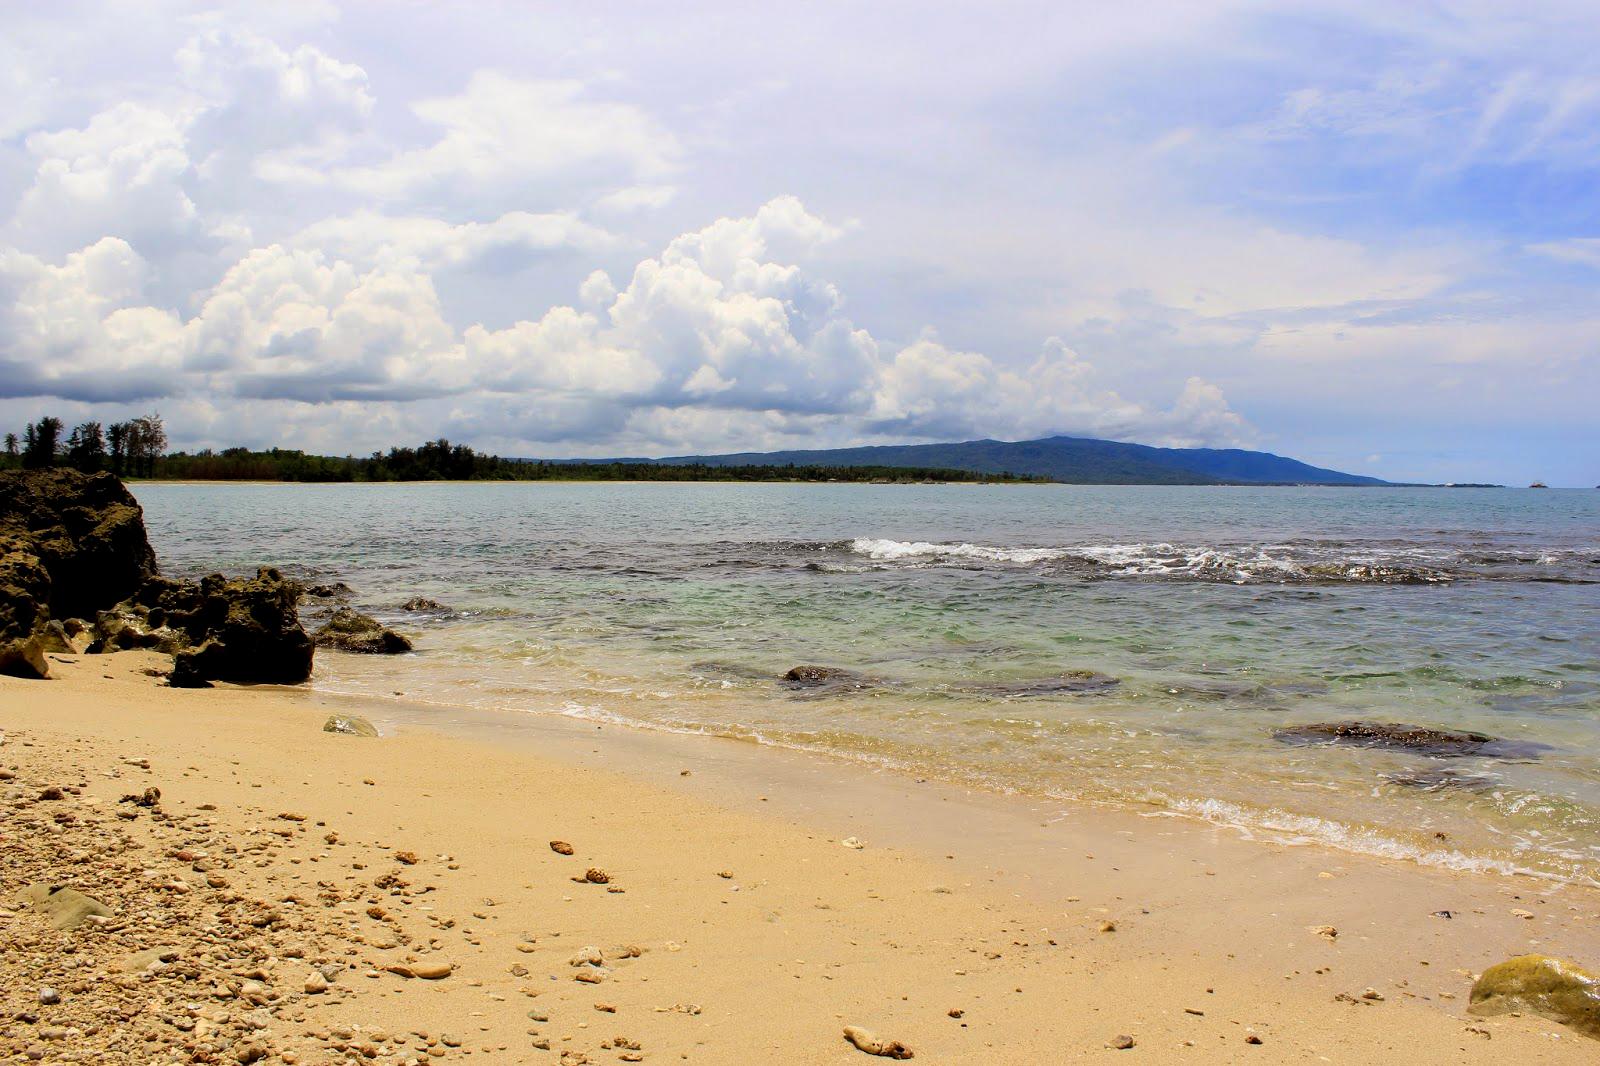 Wisata Pantai Bugel Cemara Banten